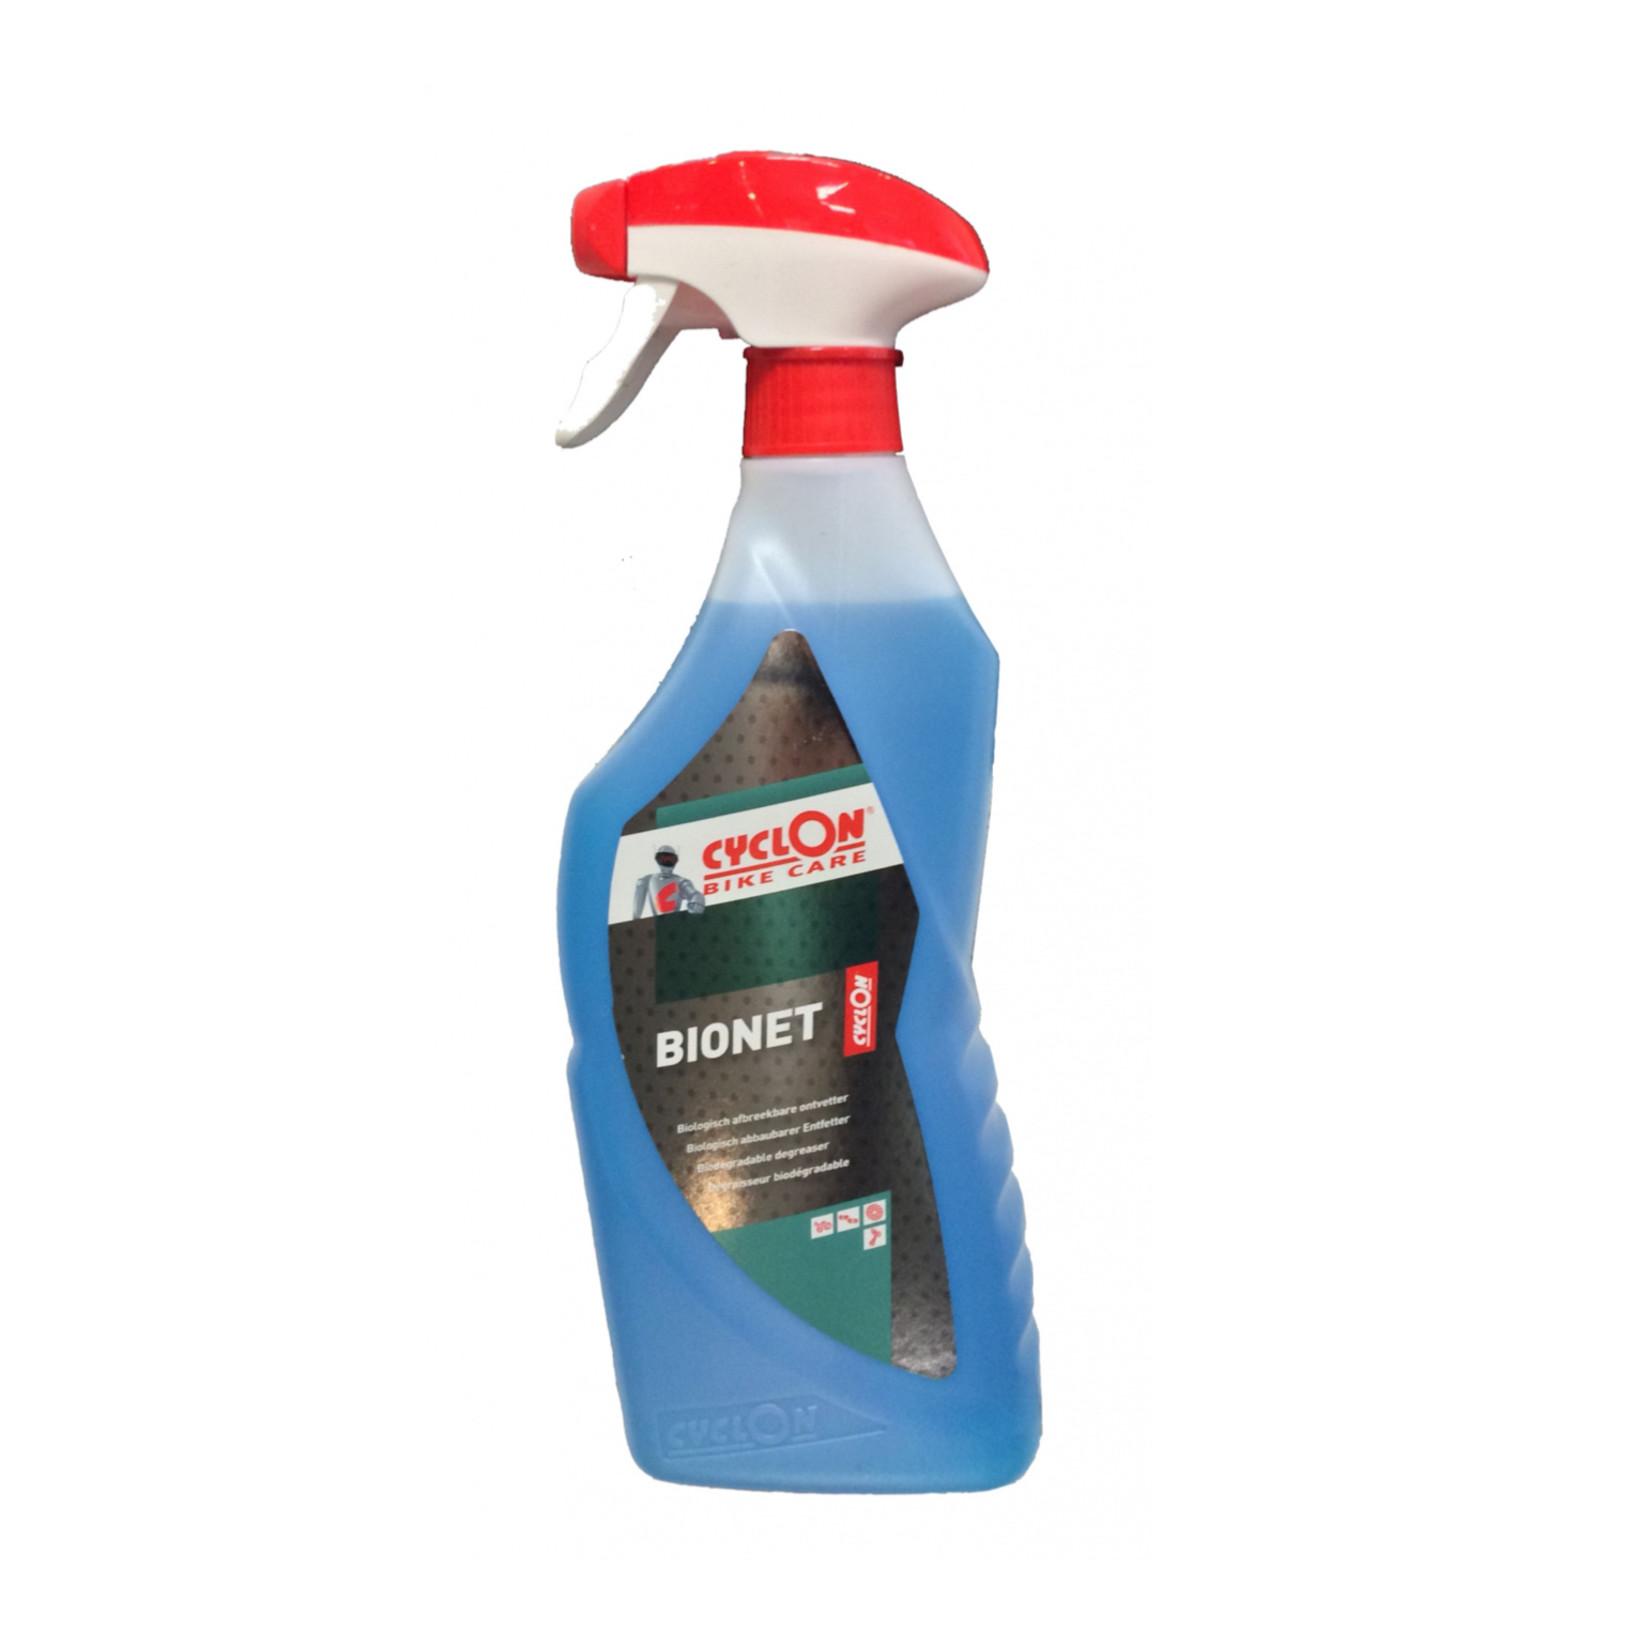 Reinigingsmiddel Cyclon Bionet 0,75 liter